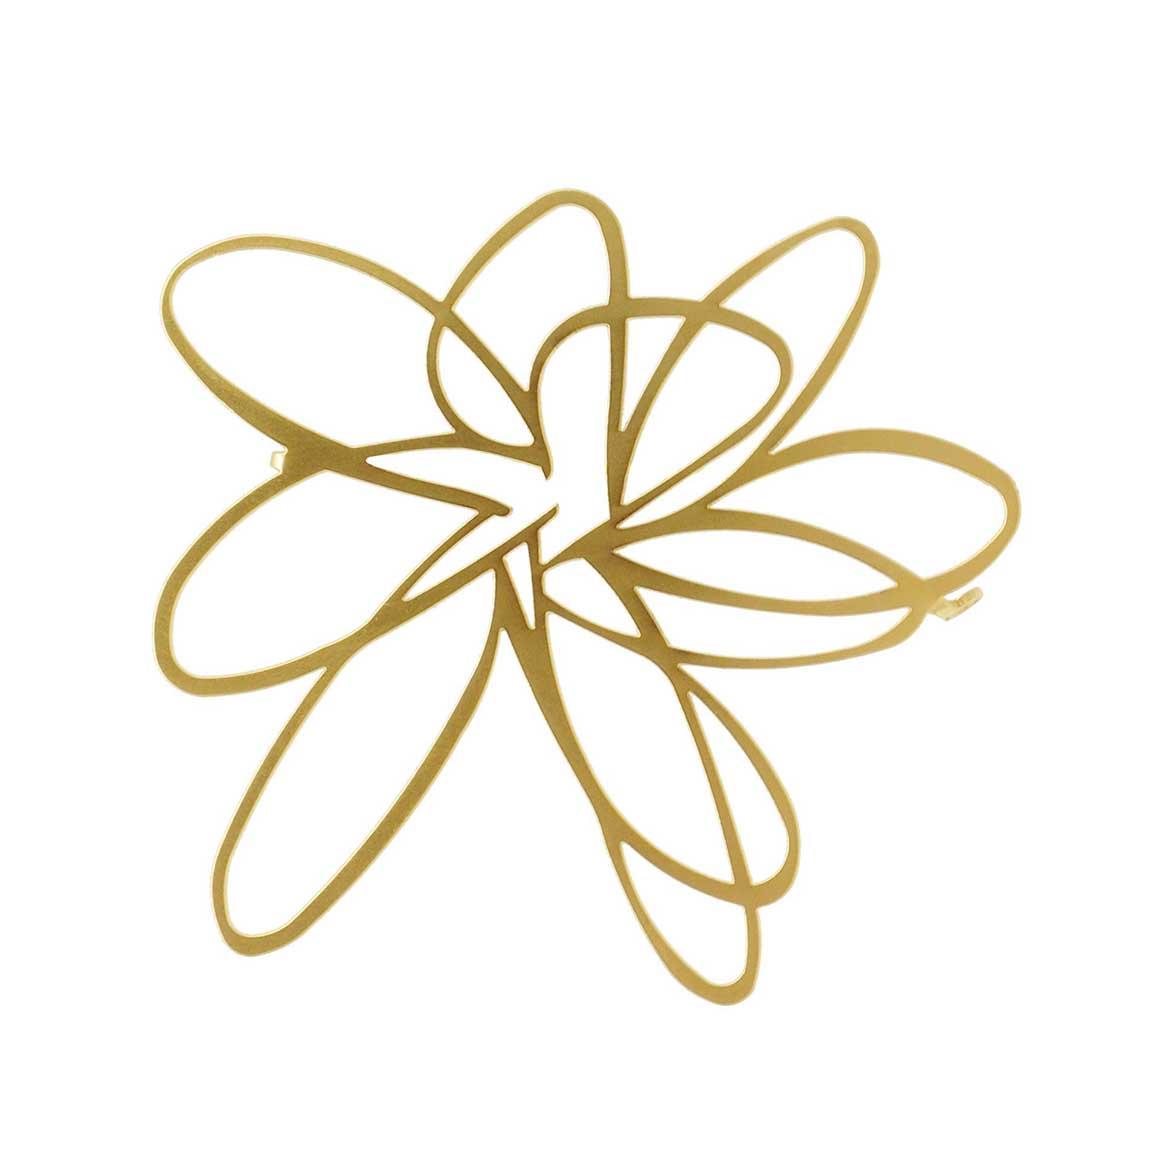 Brooch-Flower-22CT G Plate | Trada Marketplace